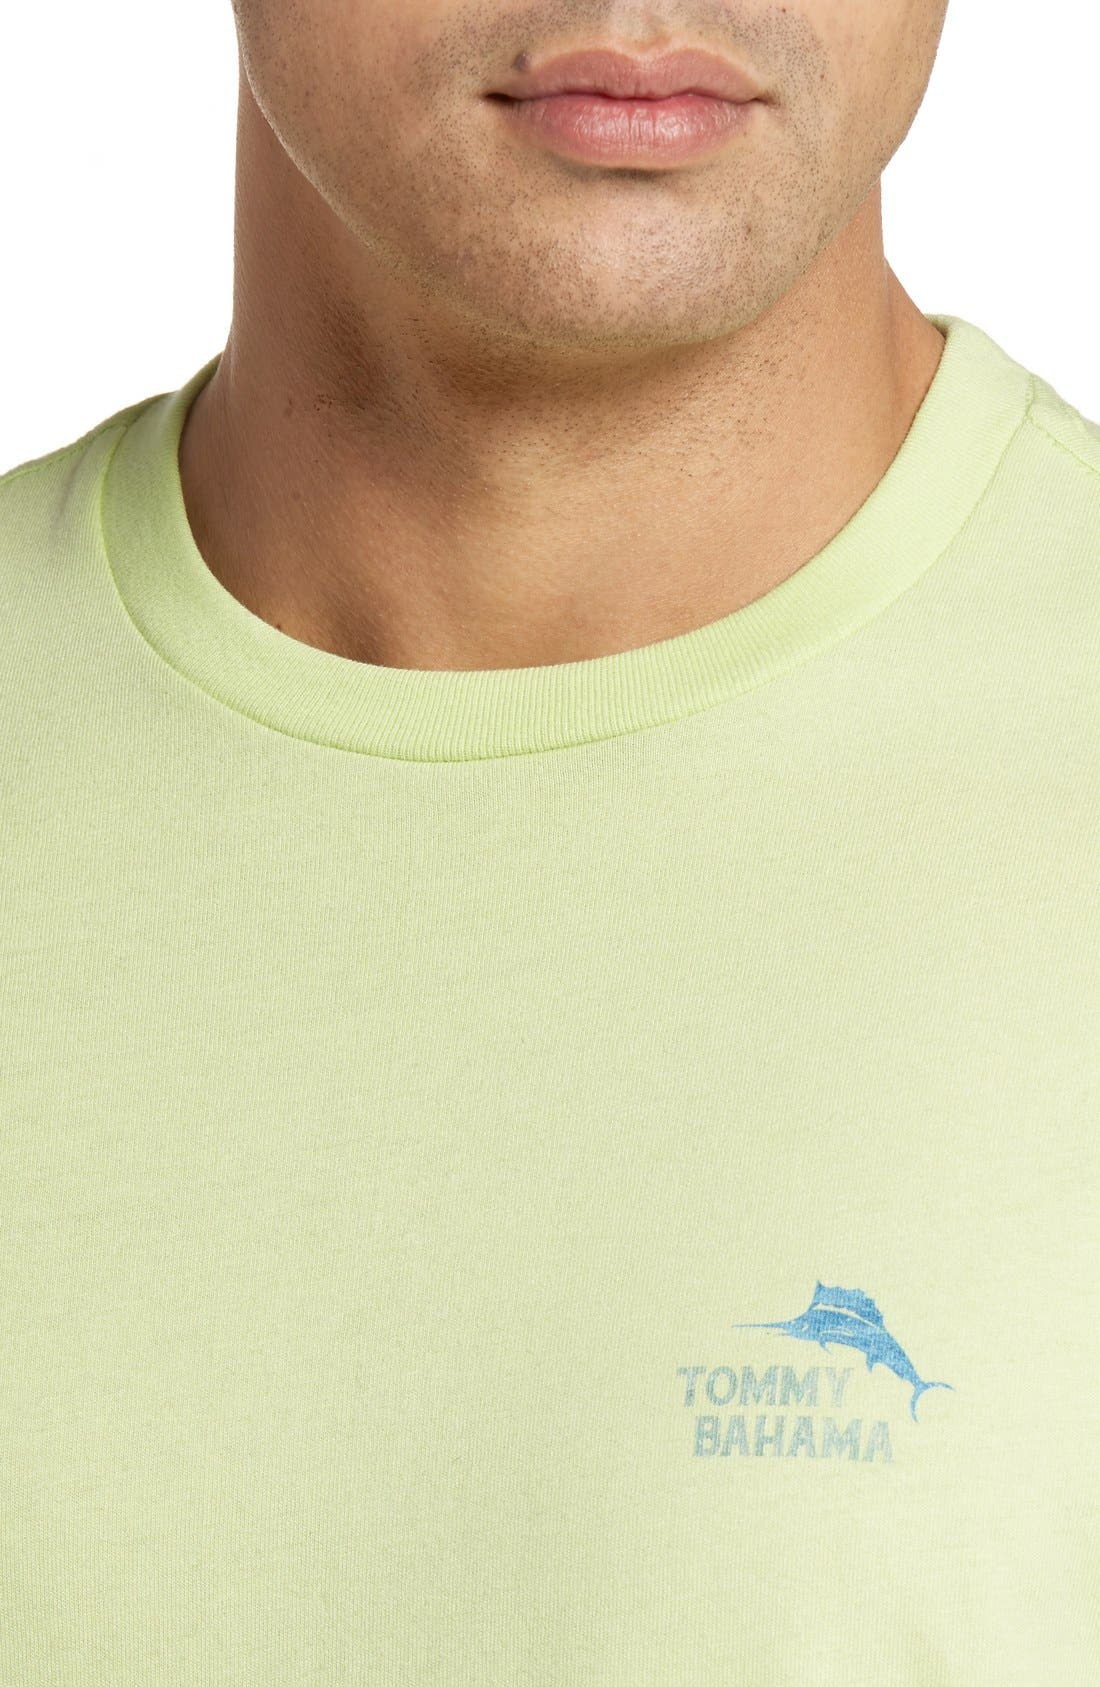 Alternate Image 4  - Tommy Bahama Keeping It Rio Graphic T-Shirt (Big & Tall)